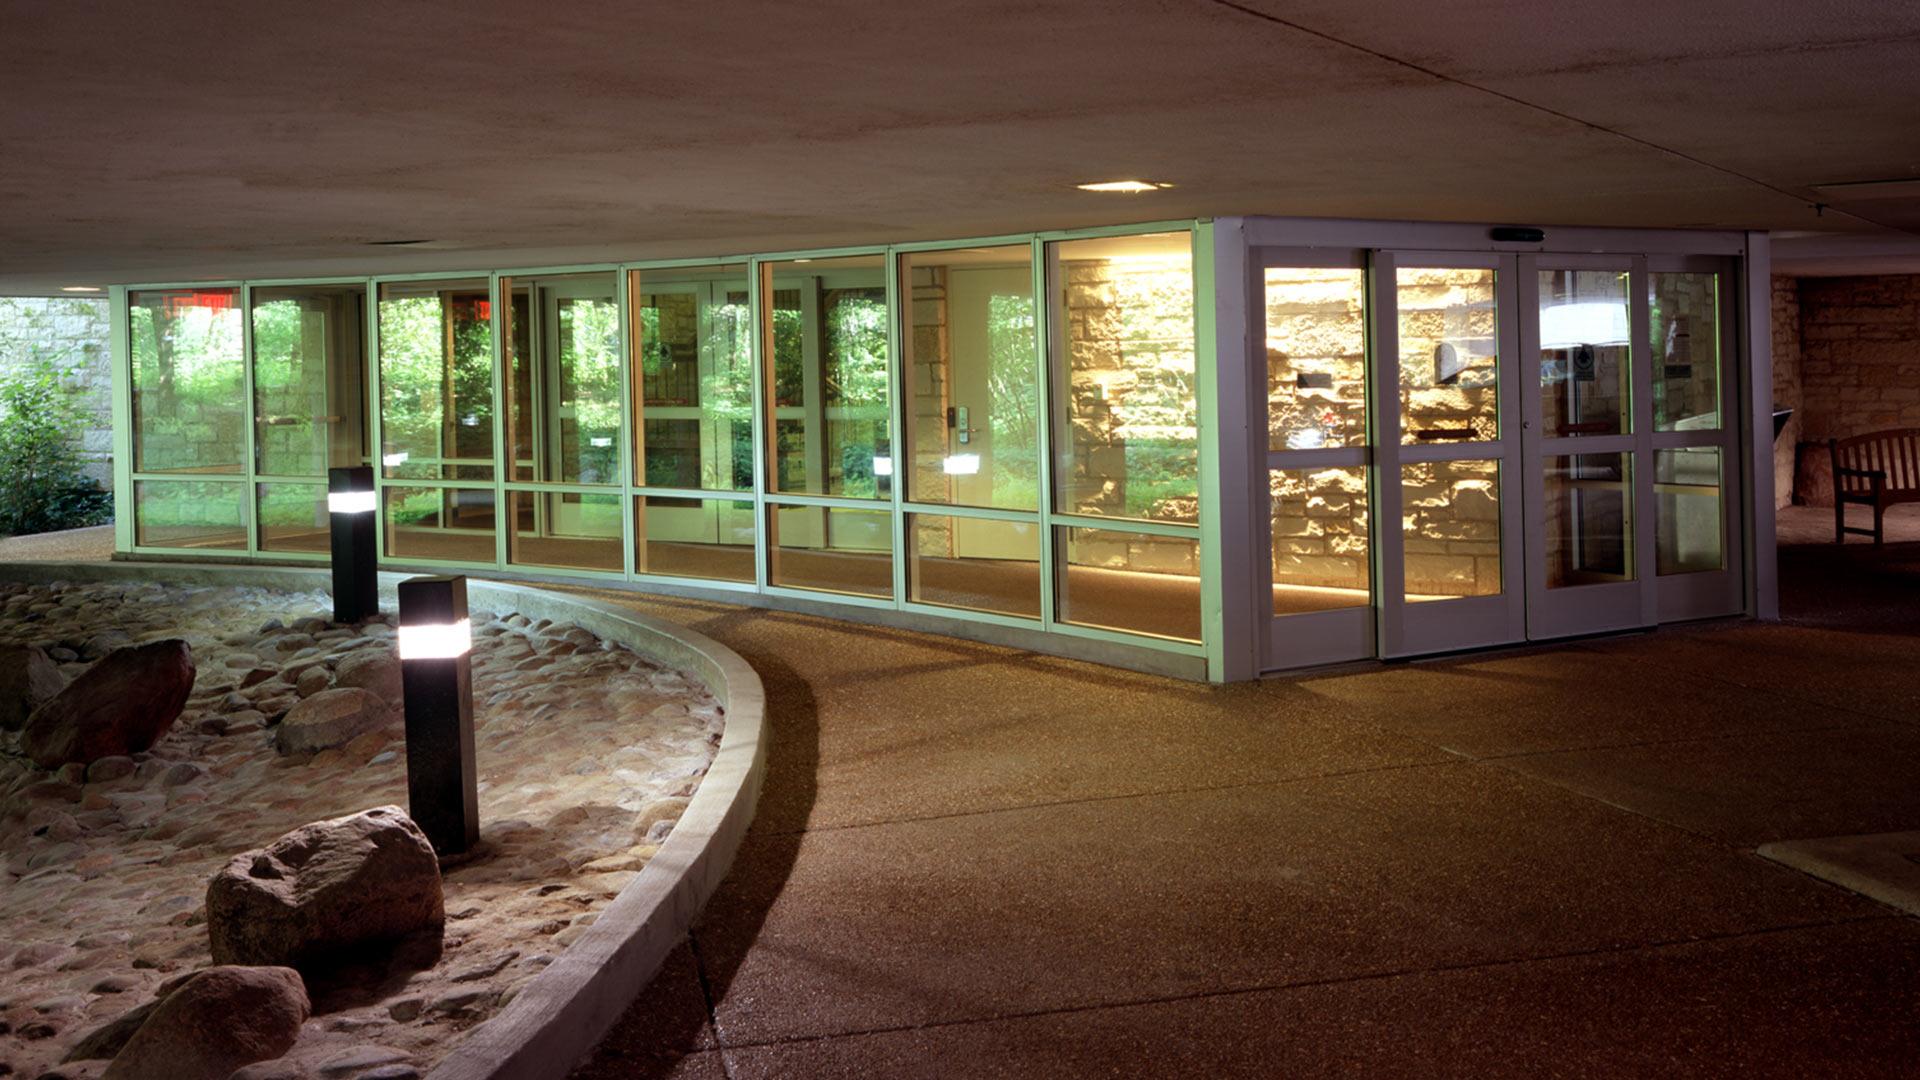 Highland Park Library Interior Renovation